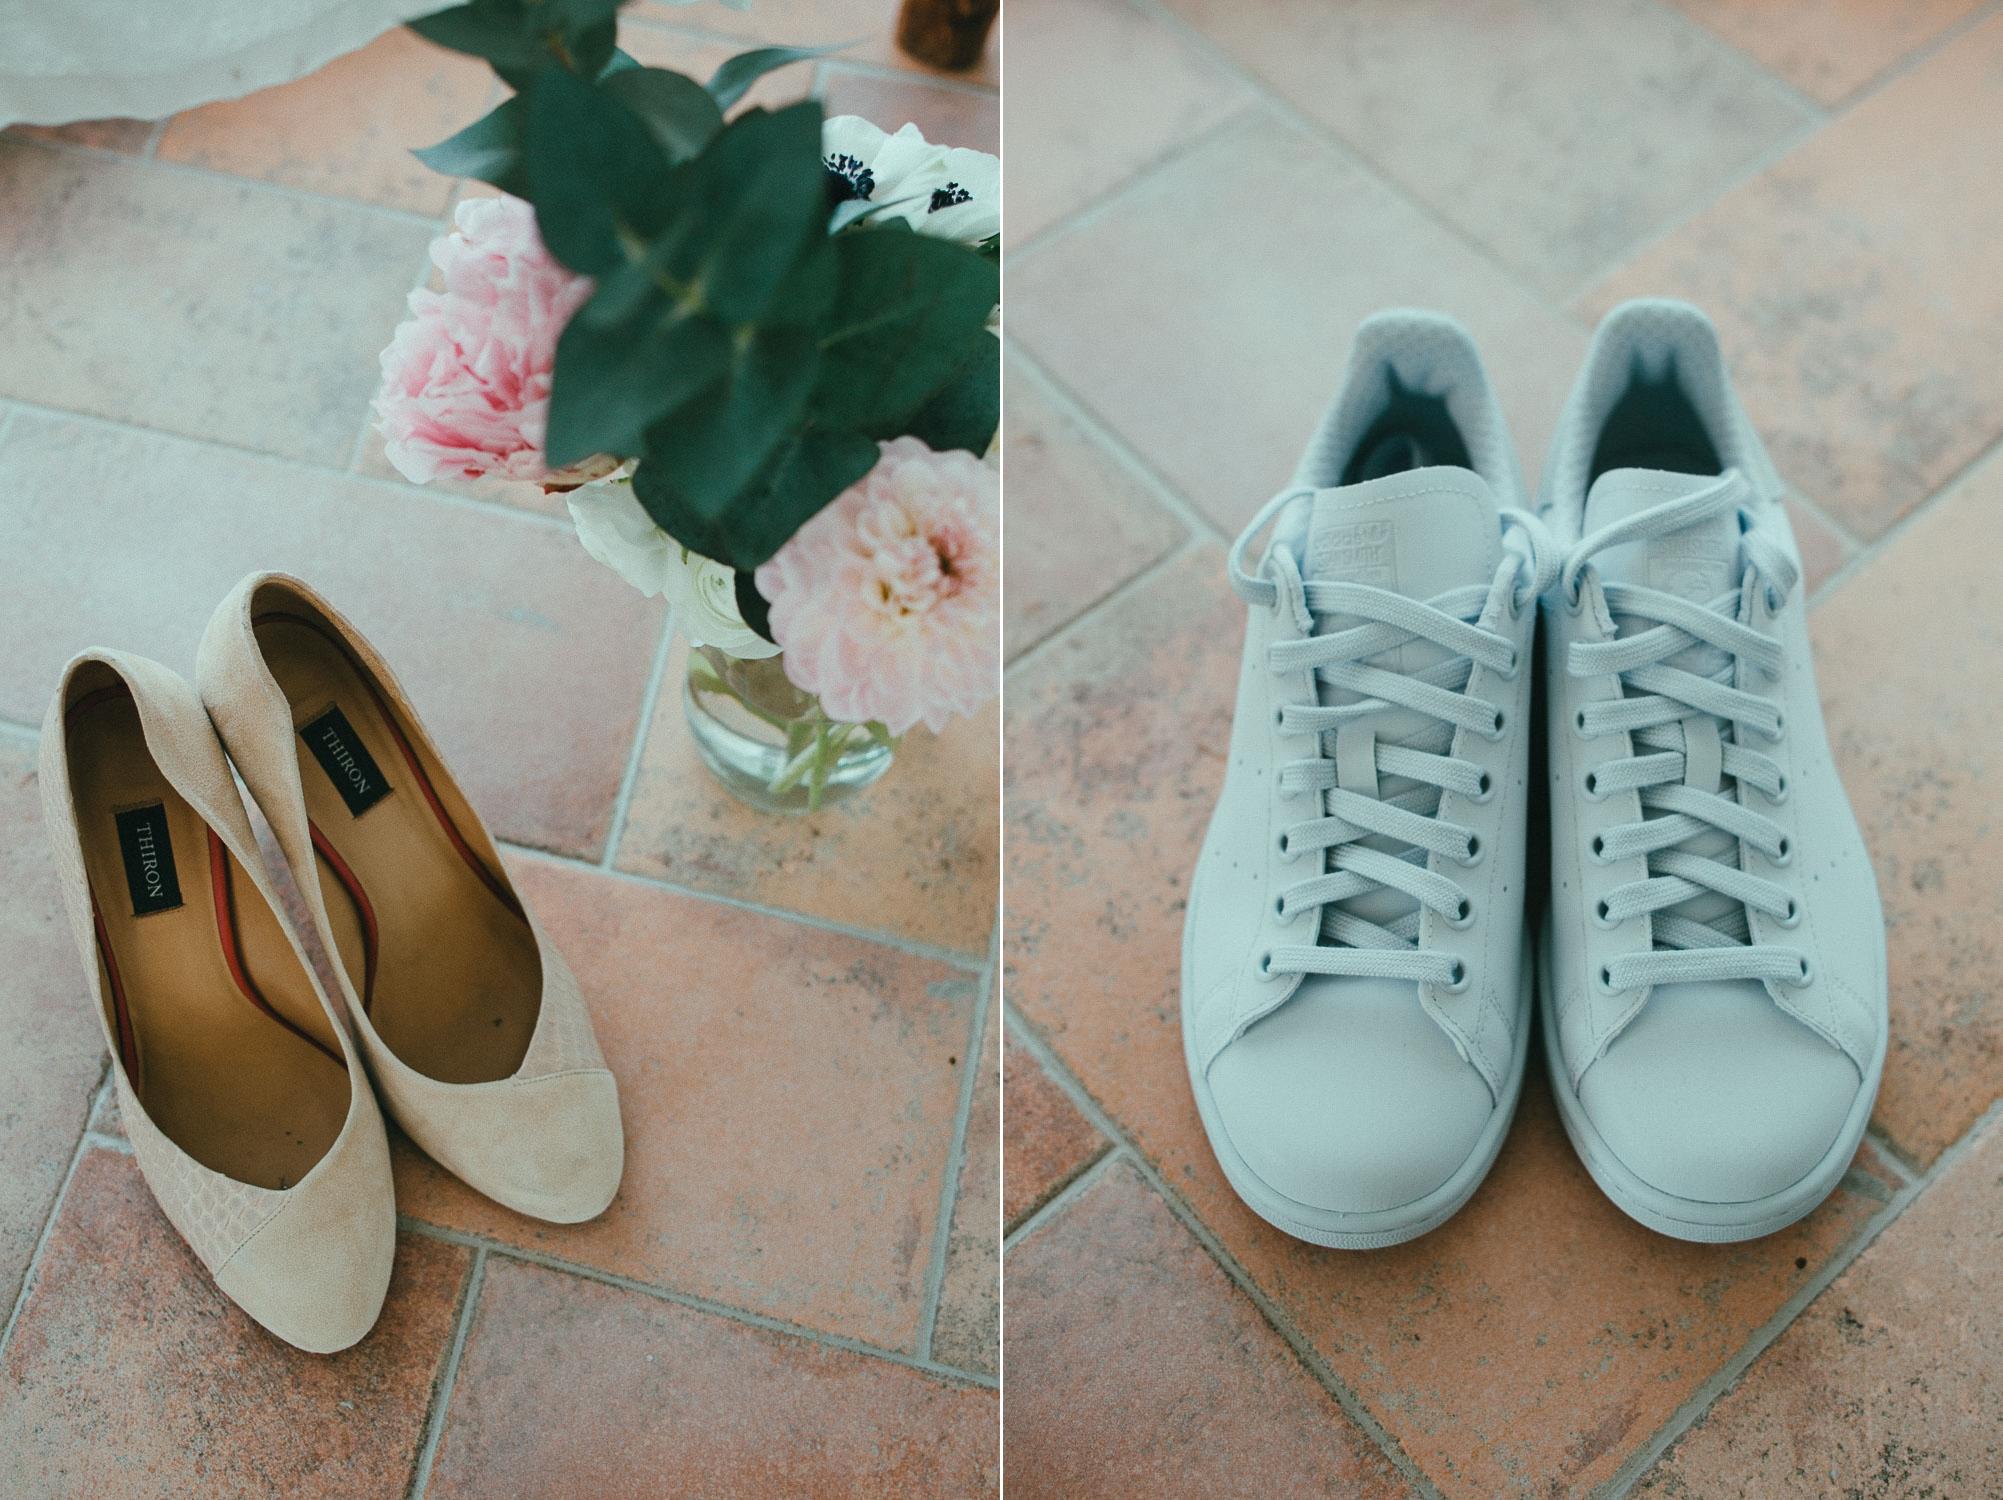 26-bride-shoes.jpg